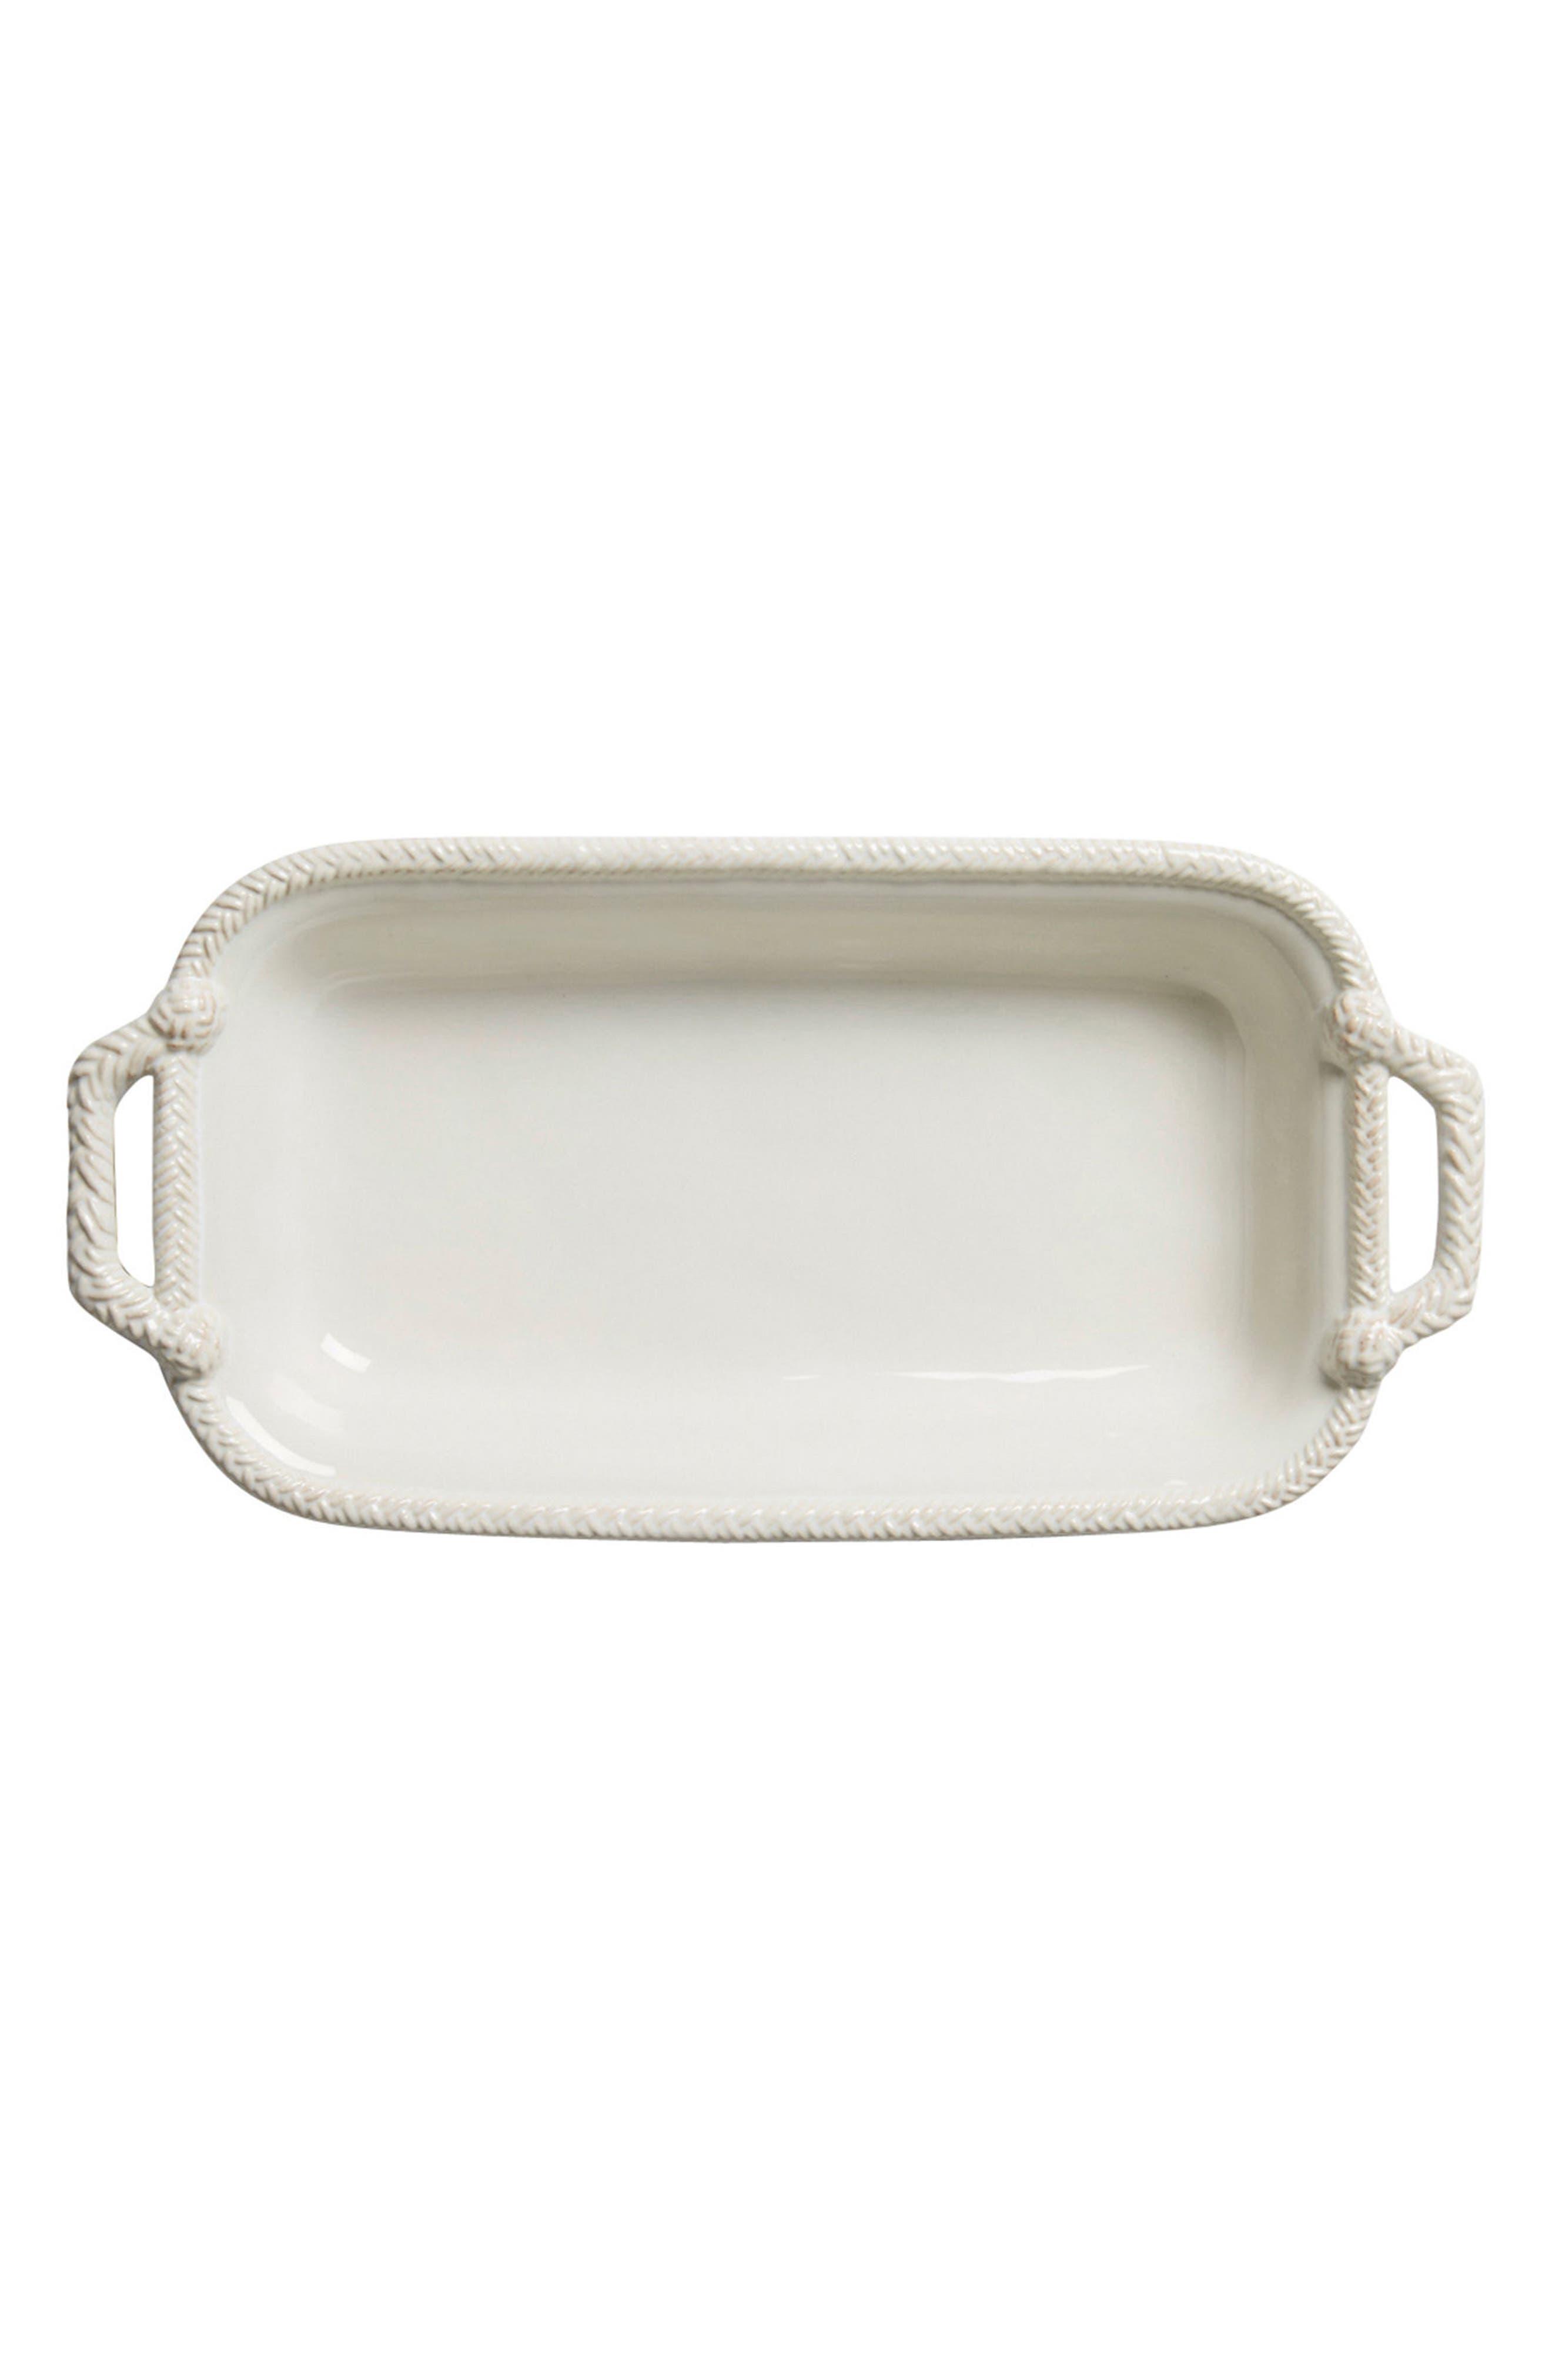 Le Panier 1.5-Quart Rectangular Baking Dish,                         Main,                         color, WHITEWASH